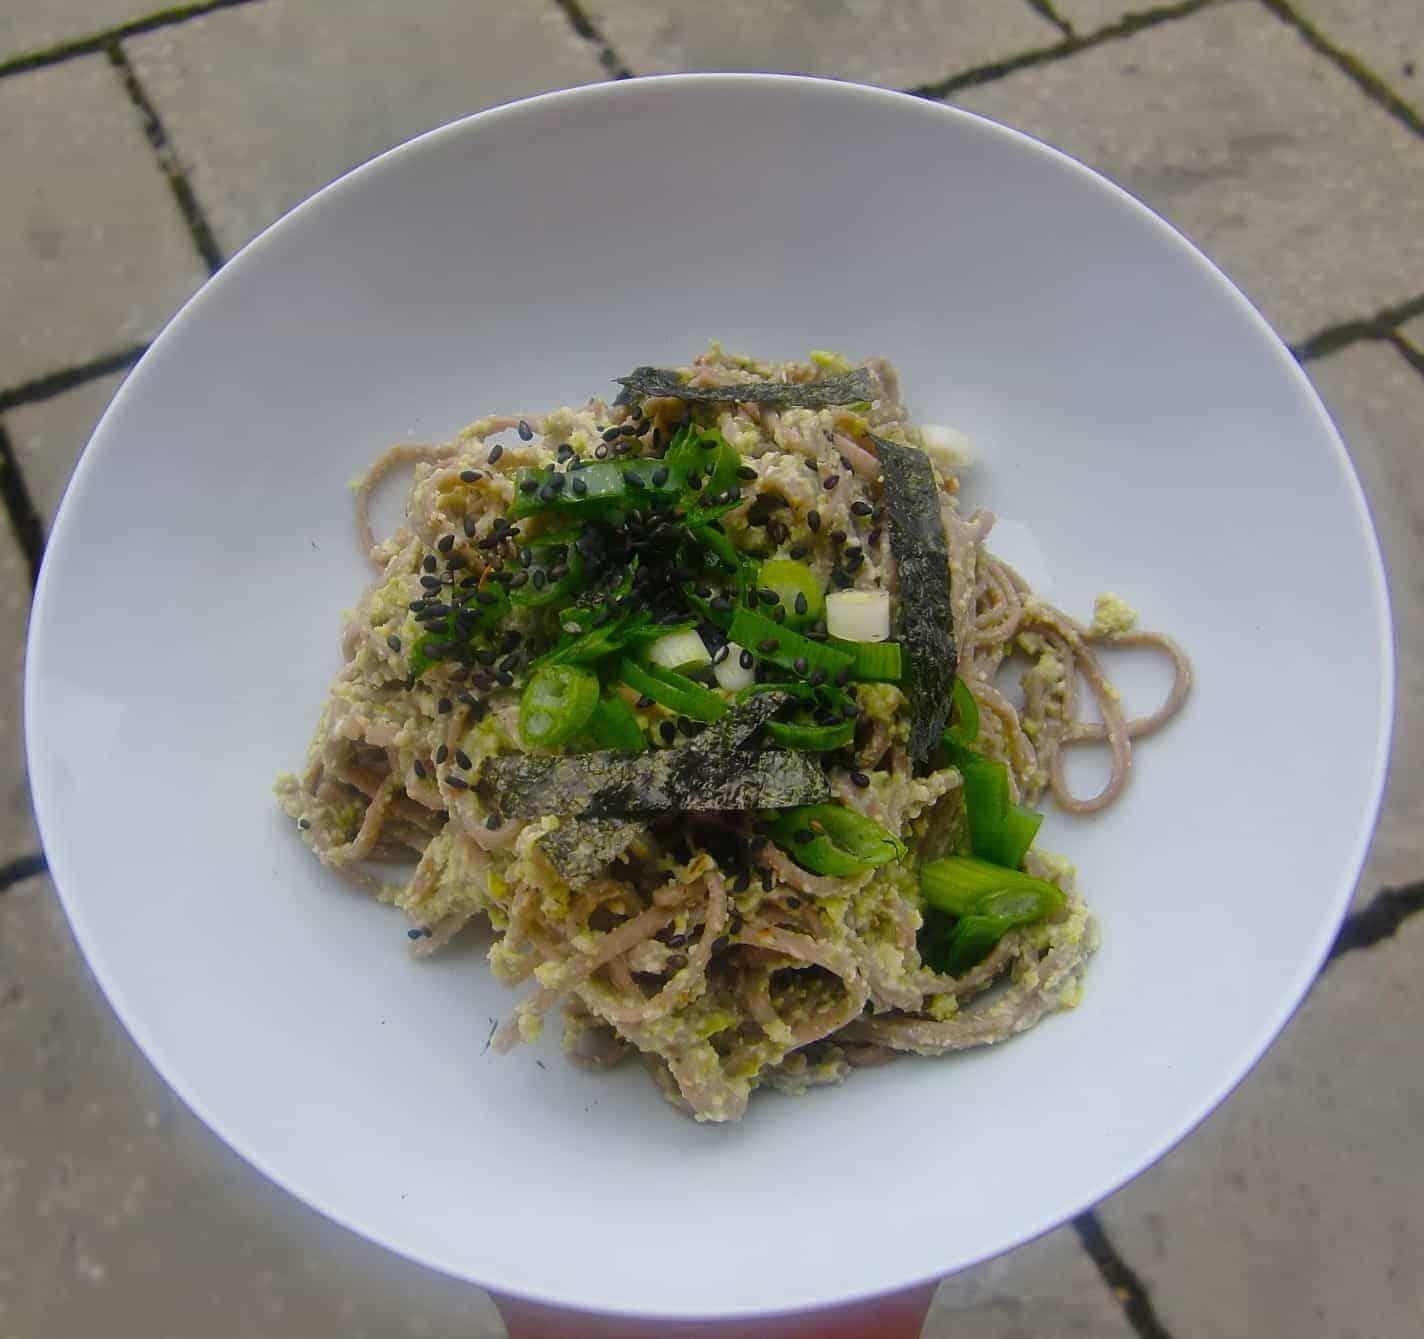 Vegan Edamame Pesto with Soba Noodles (GF)